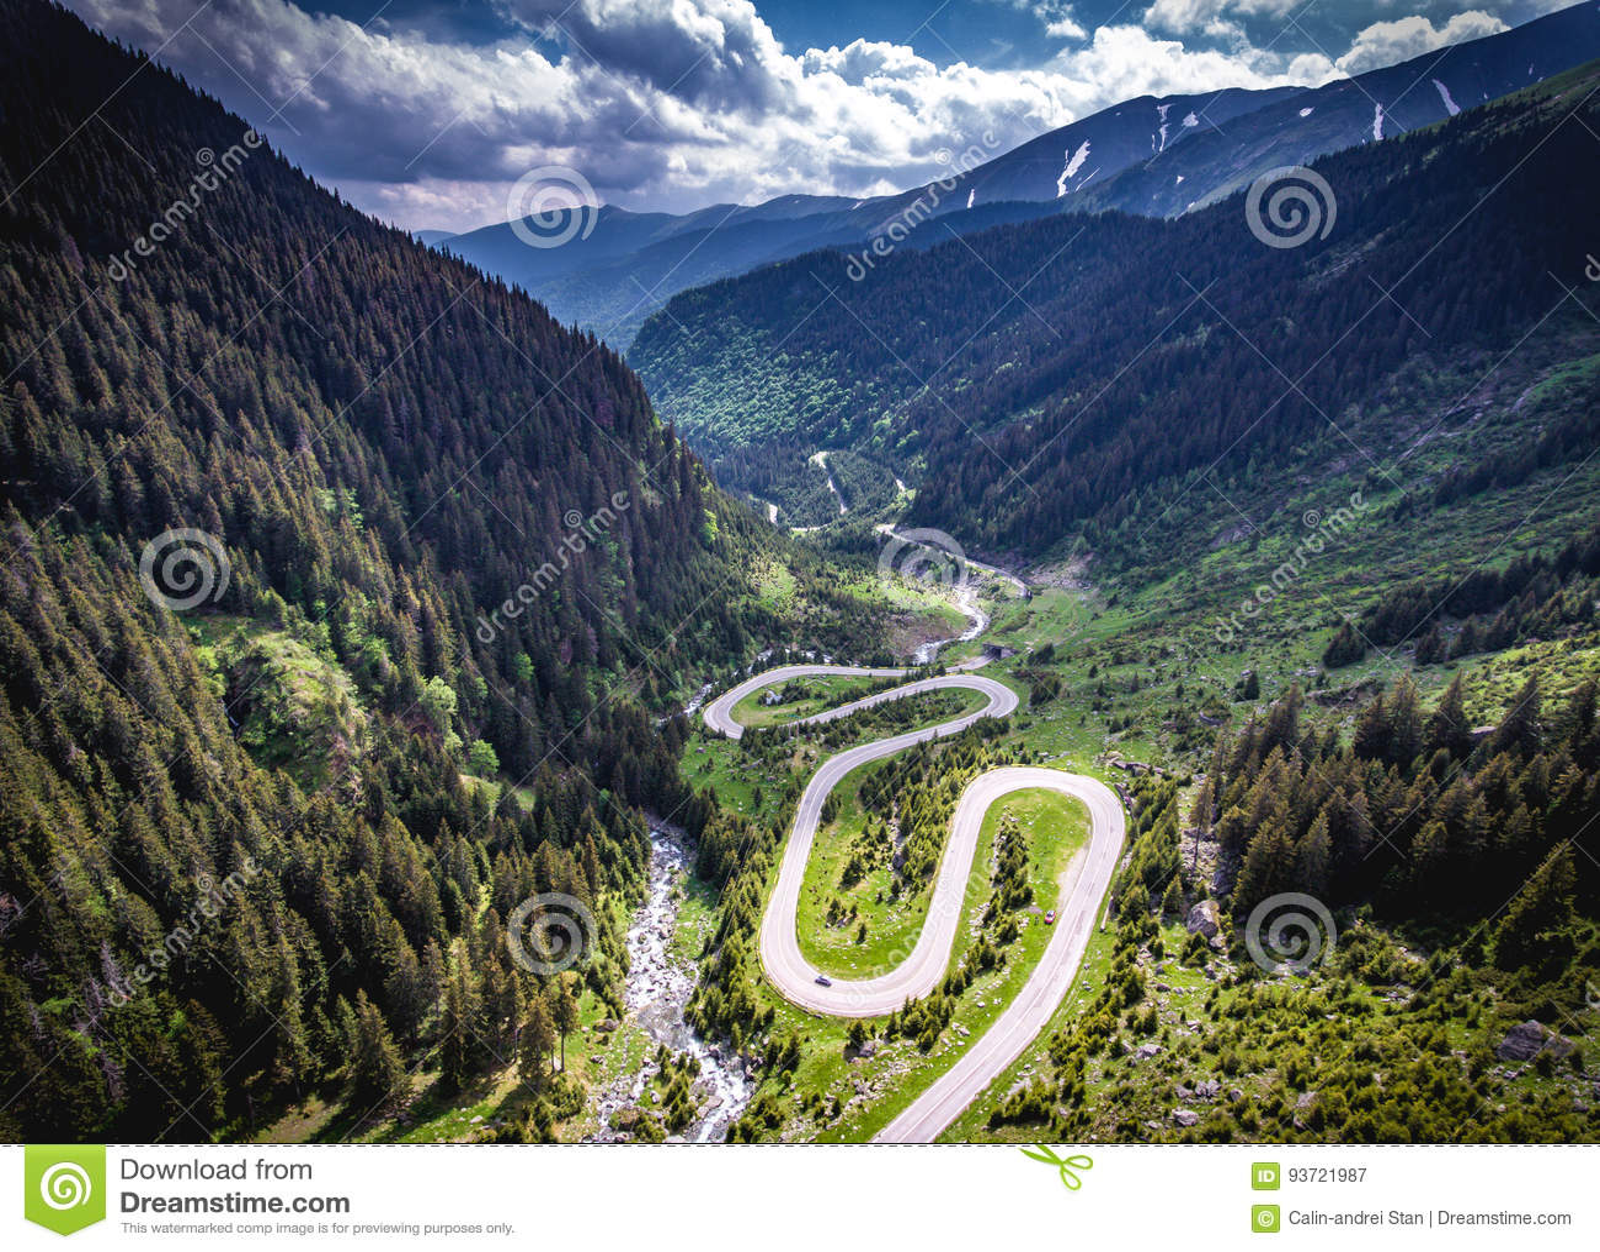 Transfagarasan Romania winding road aerial view HDR image